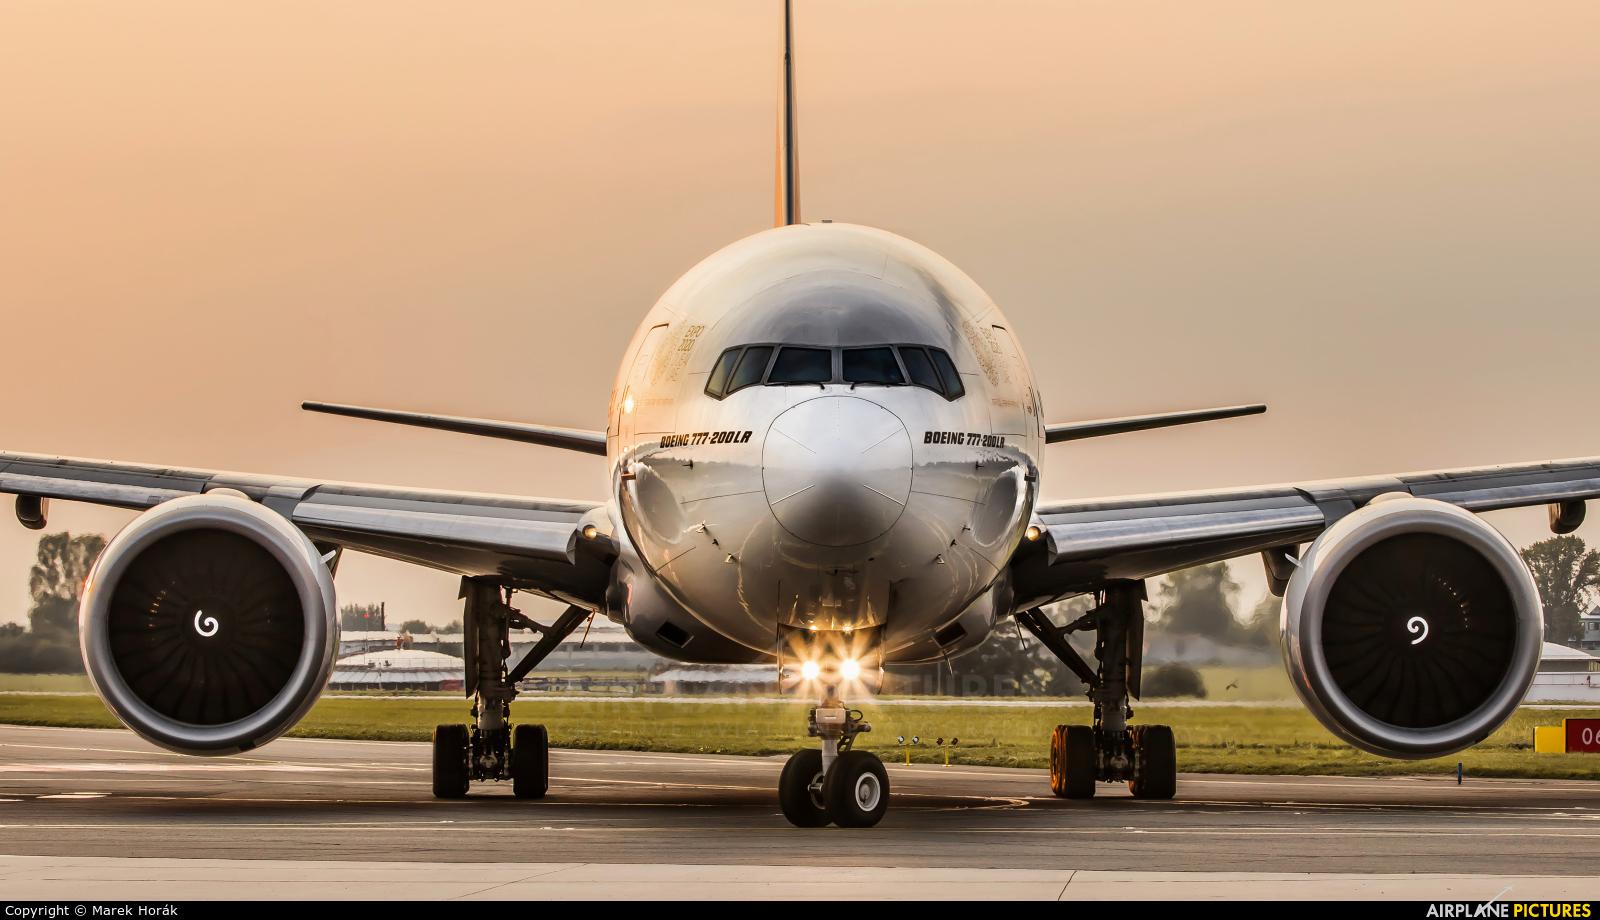 Emirates Airlines A6-EWF aircraft at Prague - Václav Havel